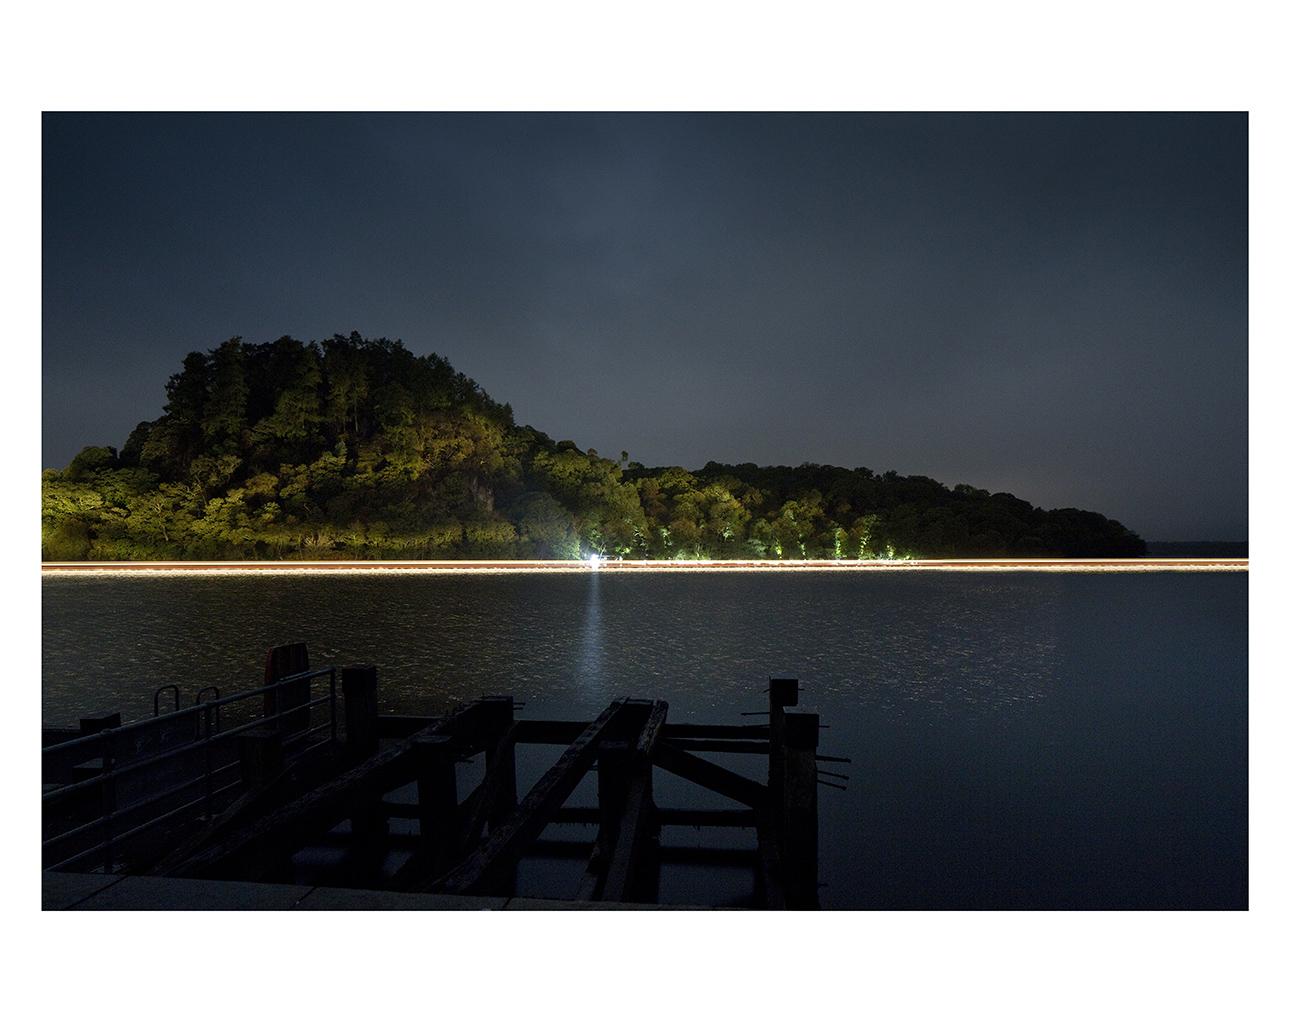 Image of Island Drift (17/10/2013) by NVA, James Johnson & Alan McAteer